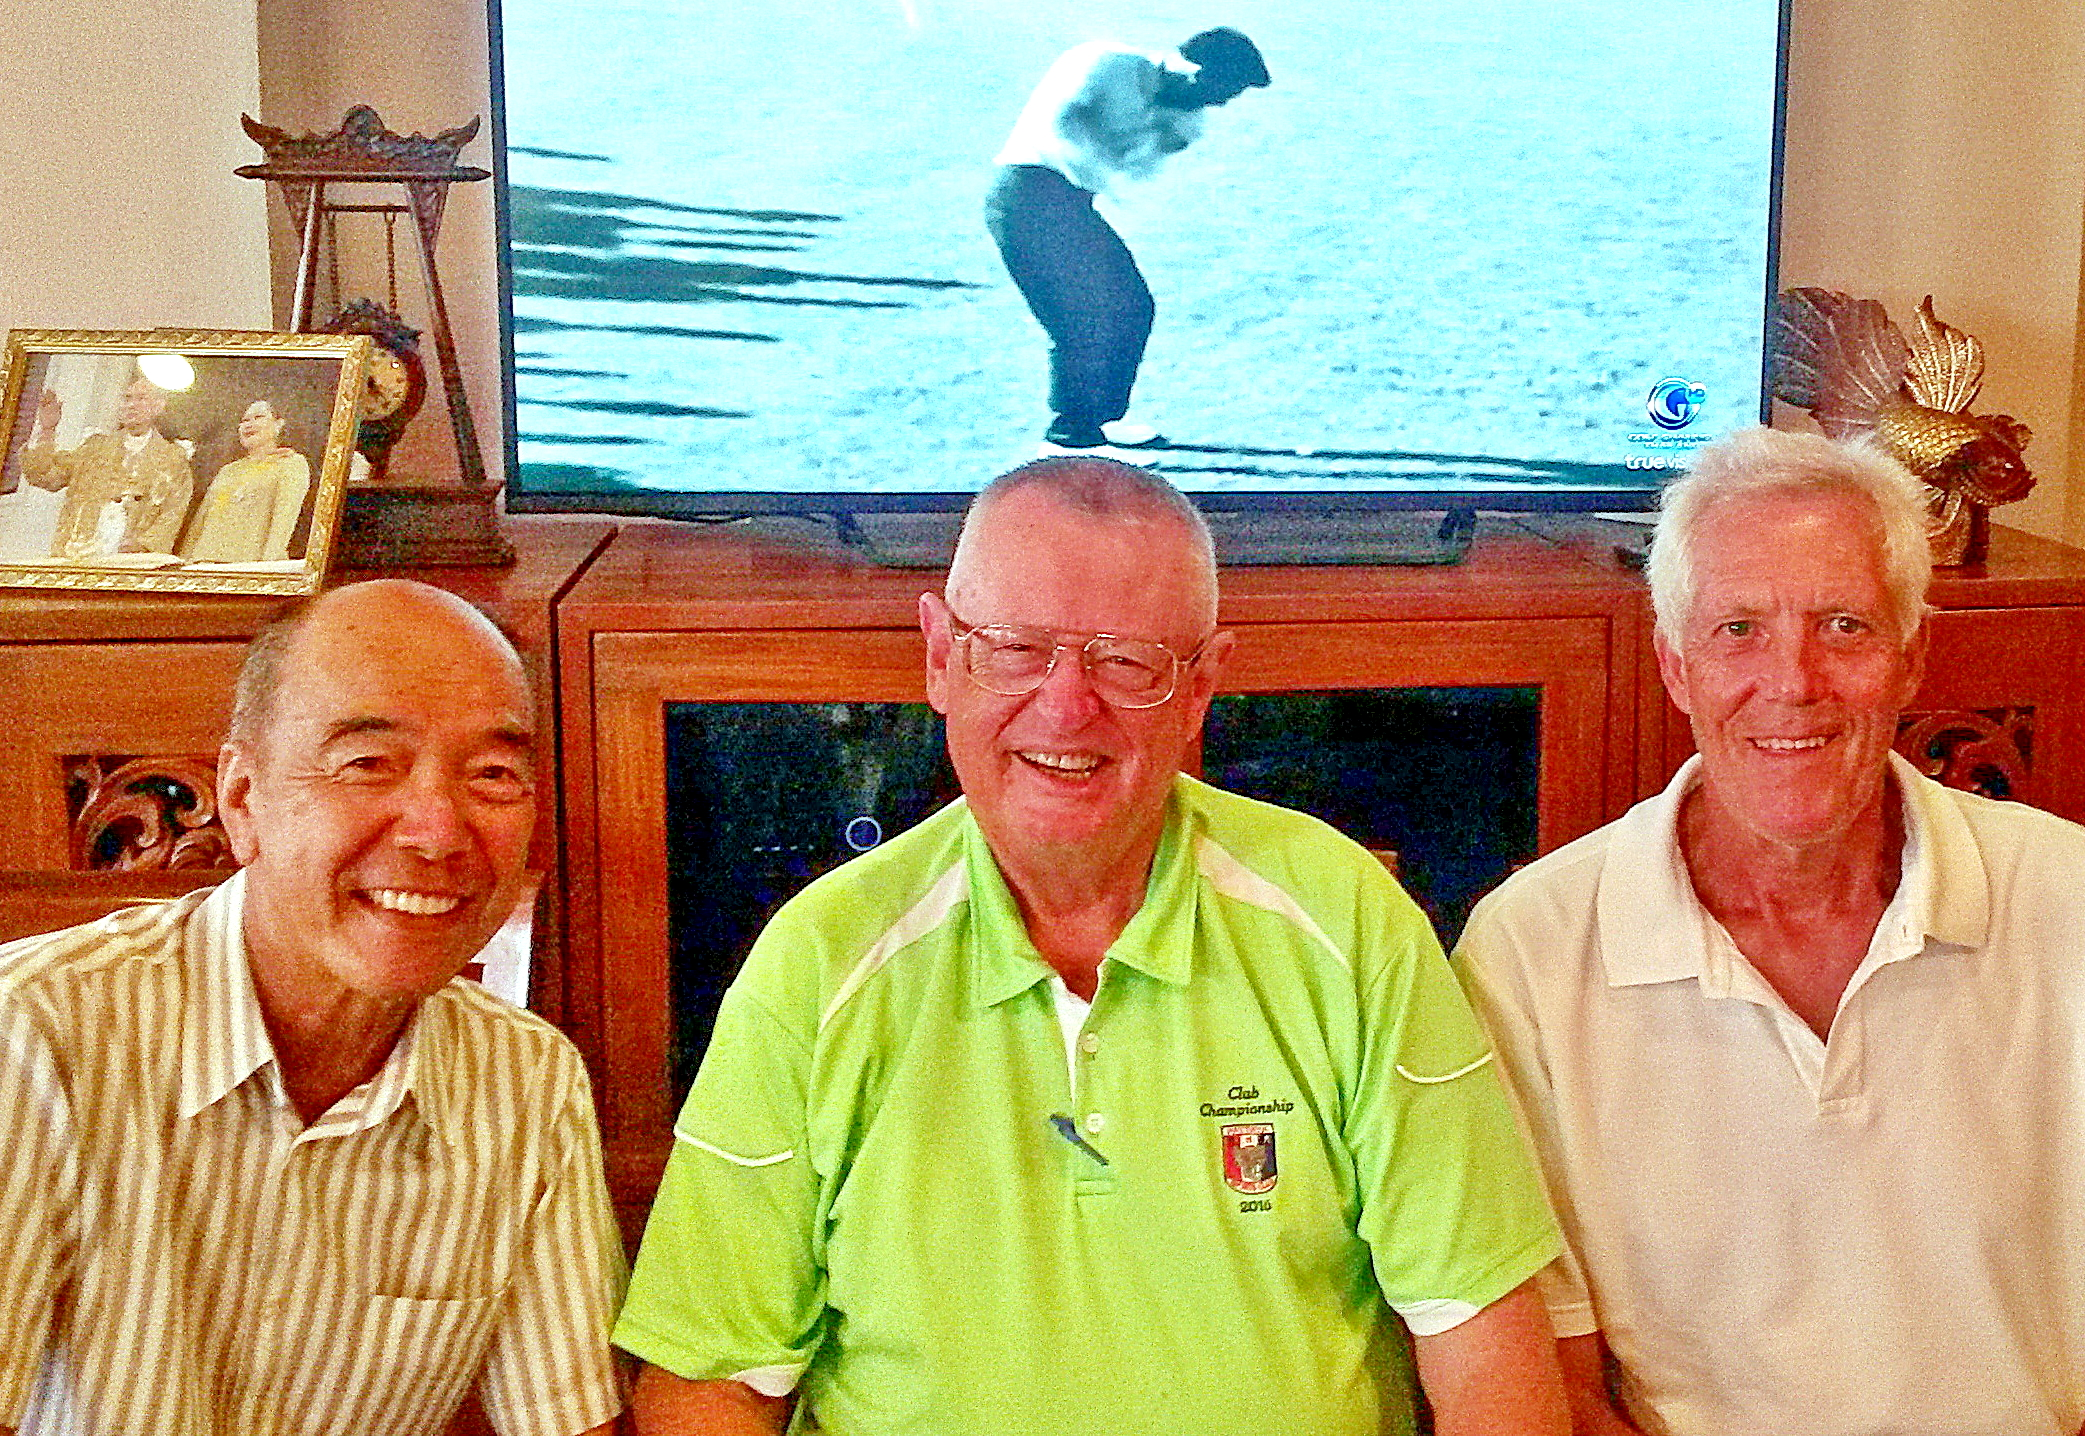 From left: Mashi Kaneta, Dick Warberg and Gordon Clegg.